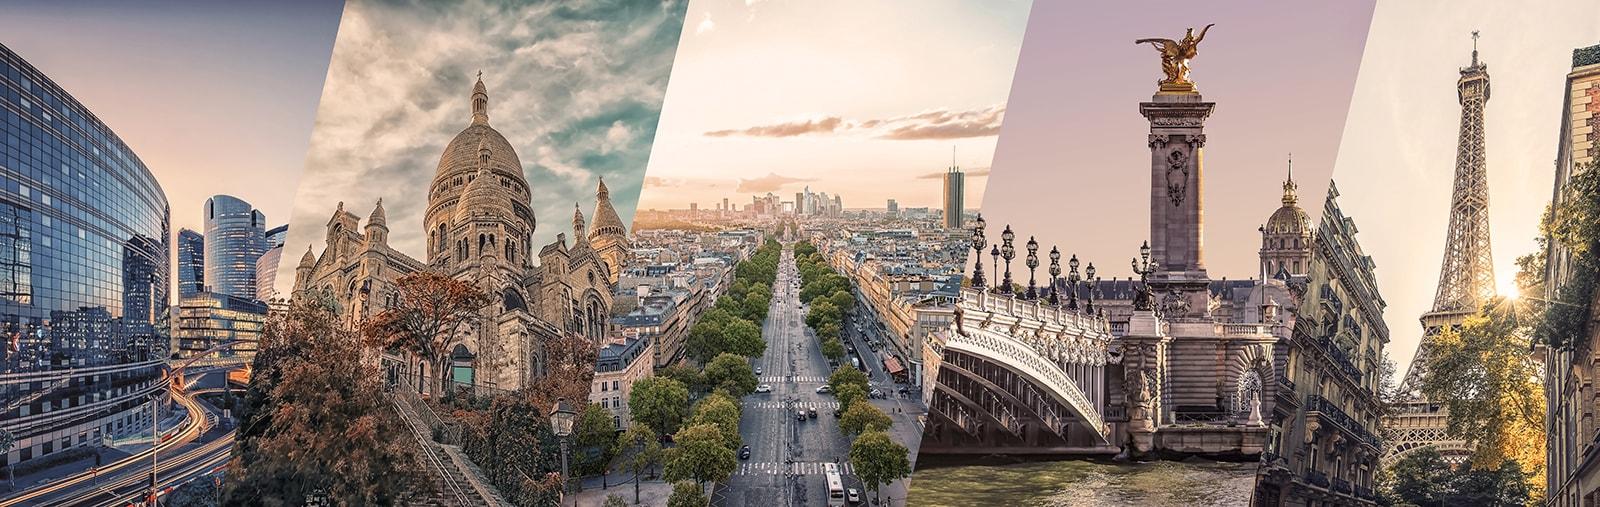 Top 10 Corporate Incentive Trip Destinations Around the World